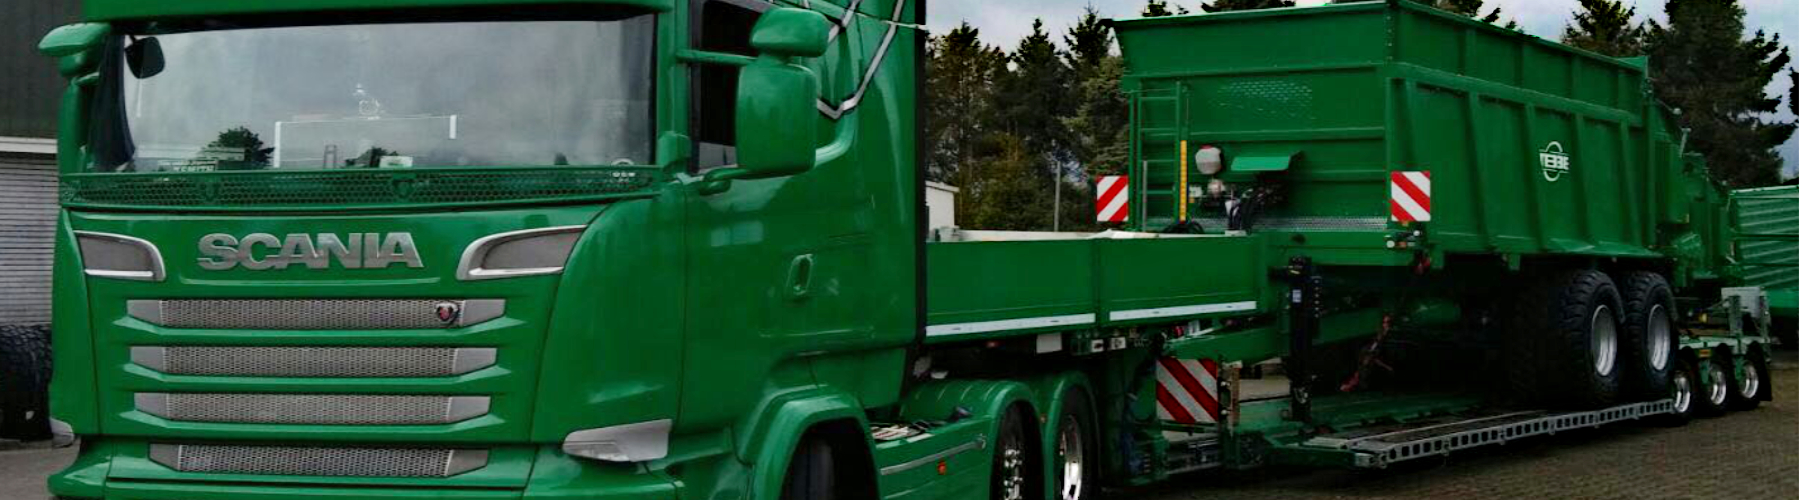 Spezialtransporte_18000x5000